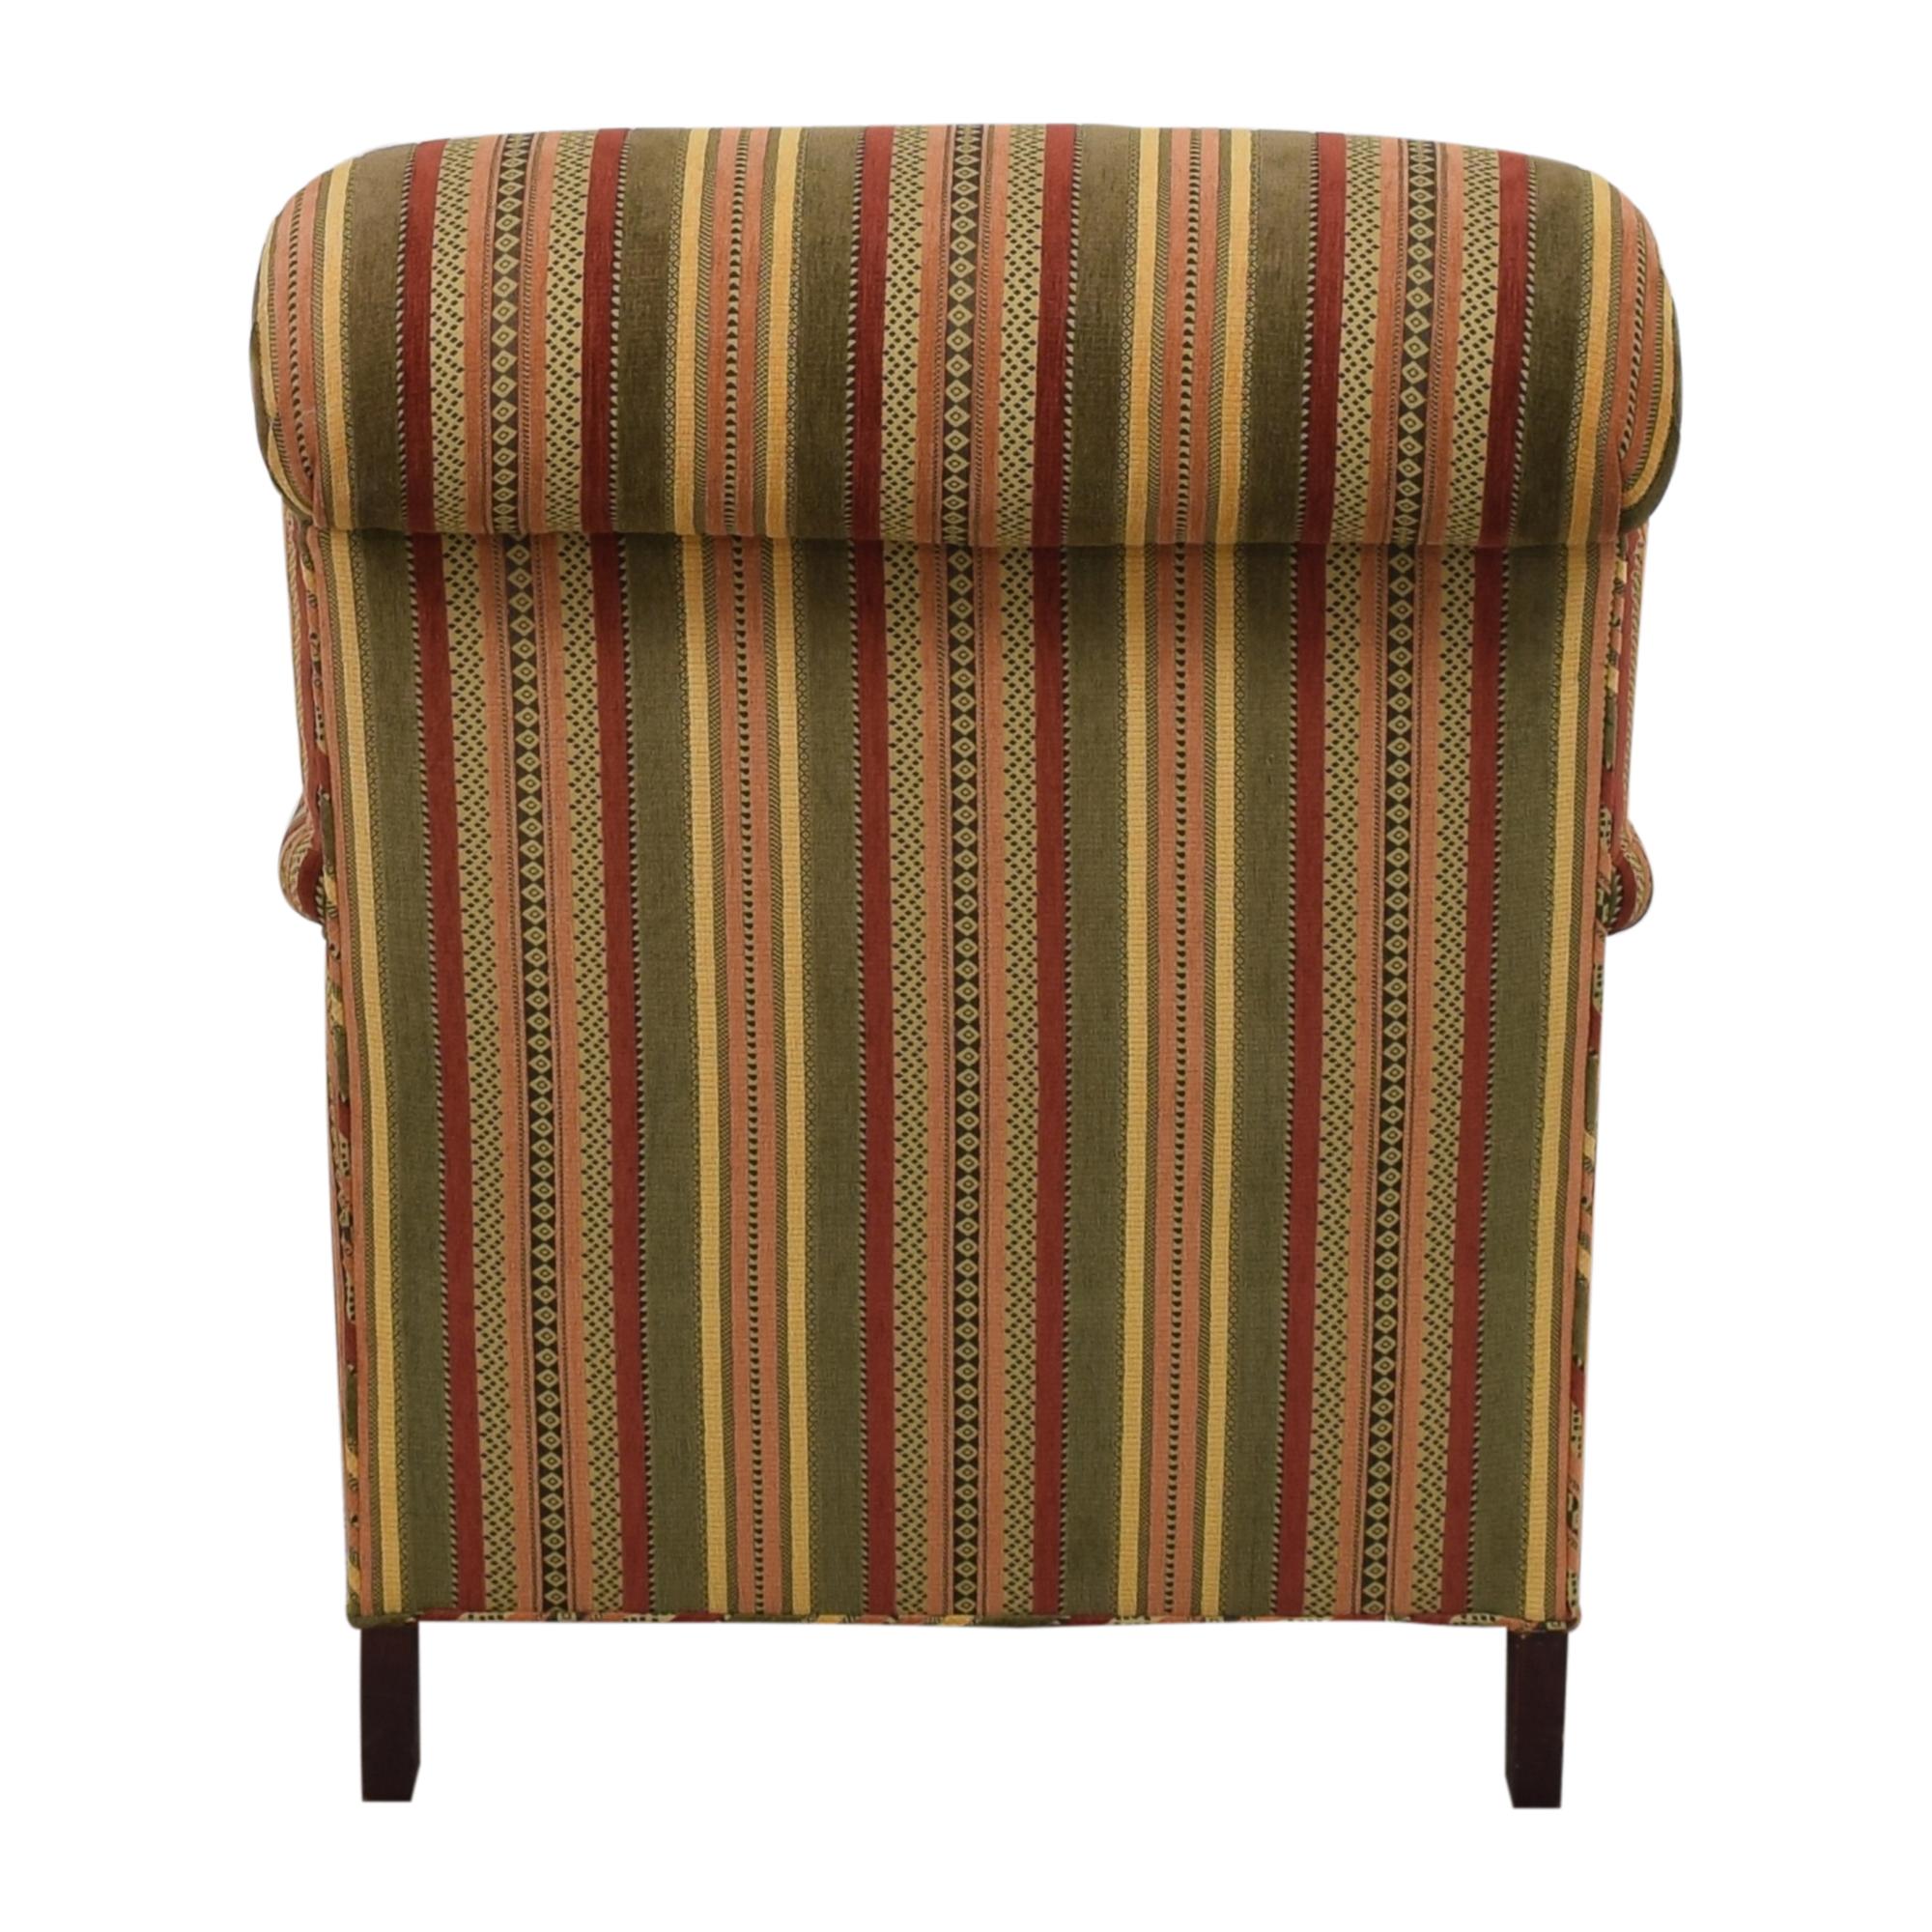 Scroll Back Bridgewater Arm Chair used